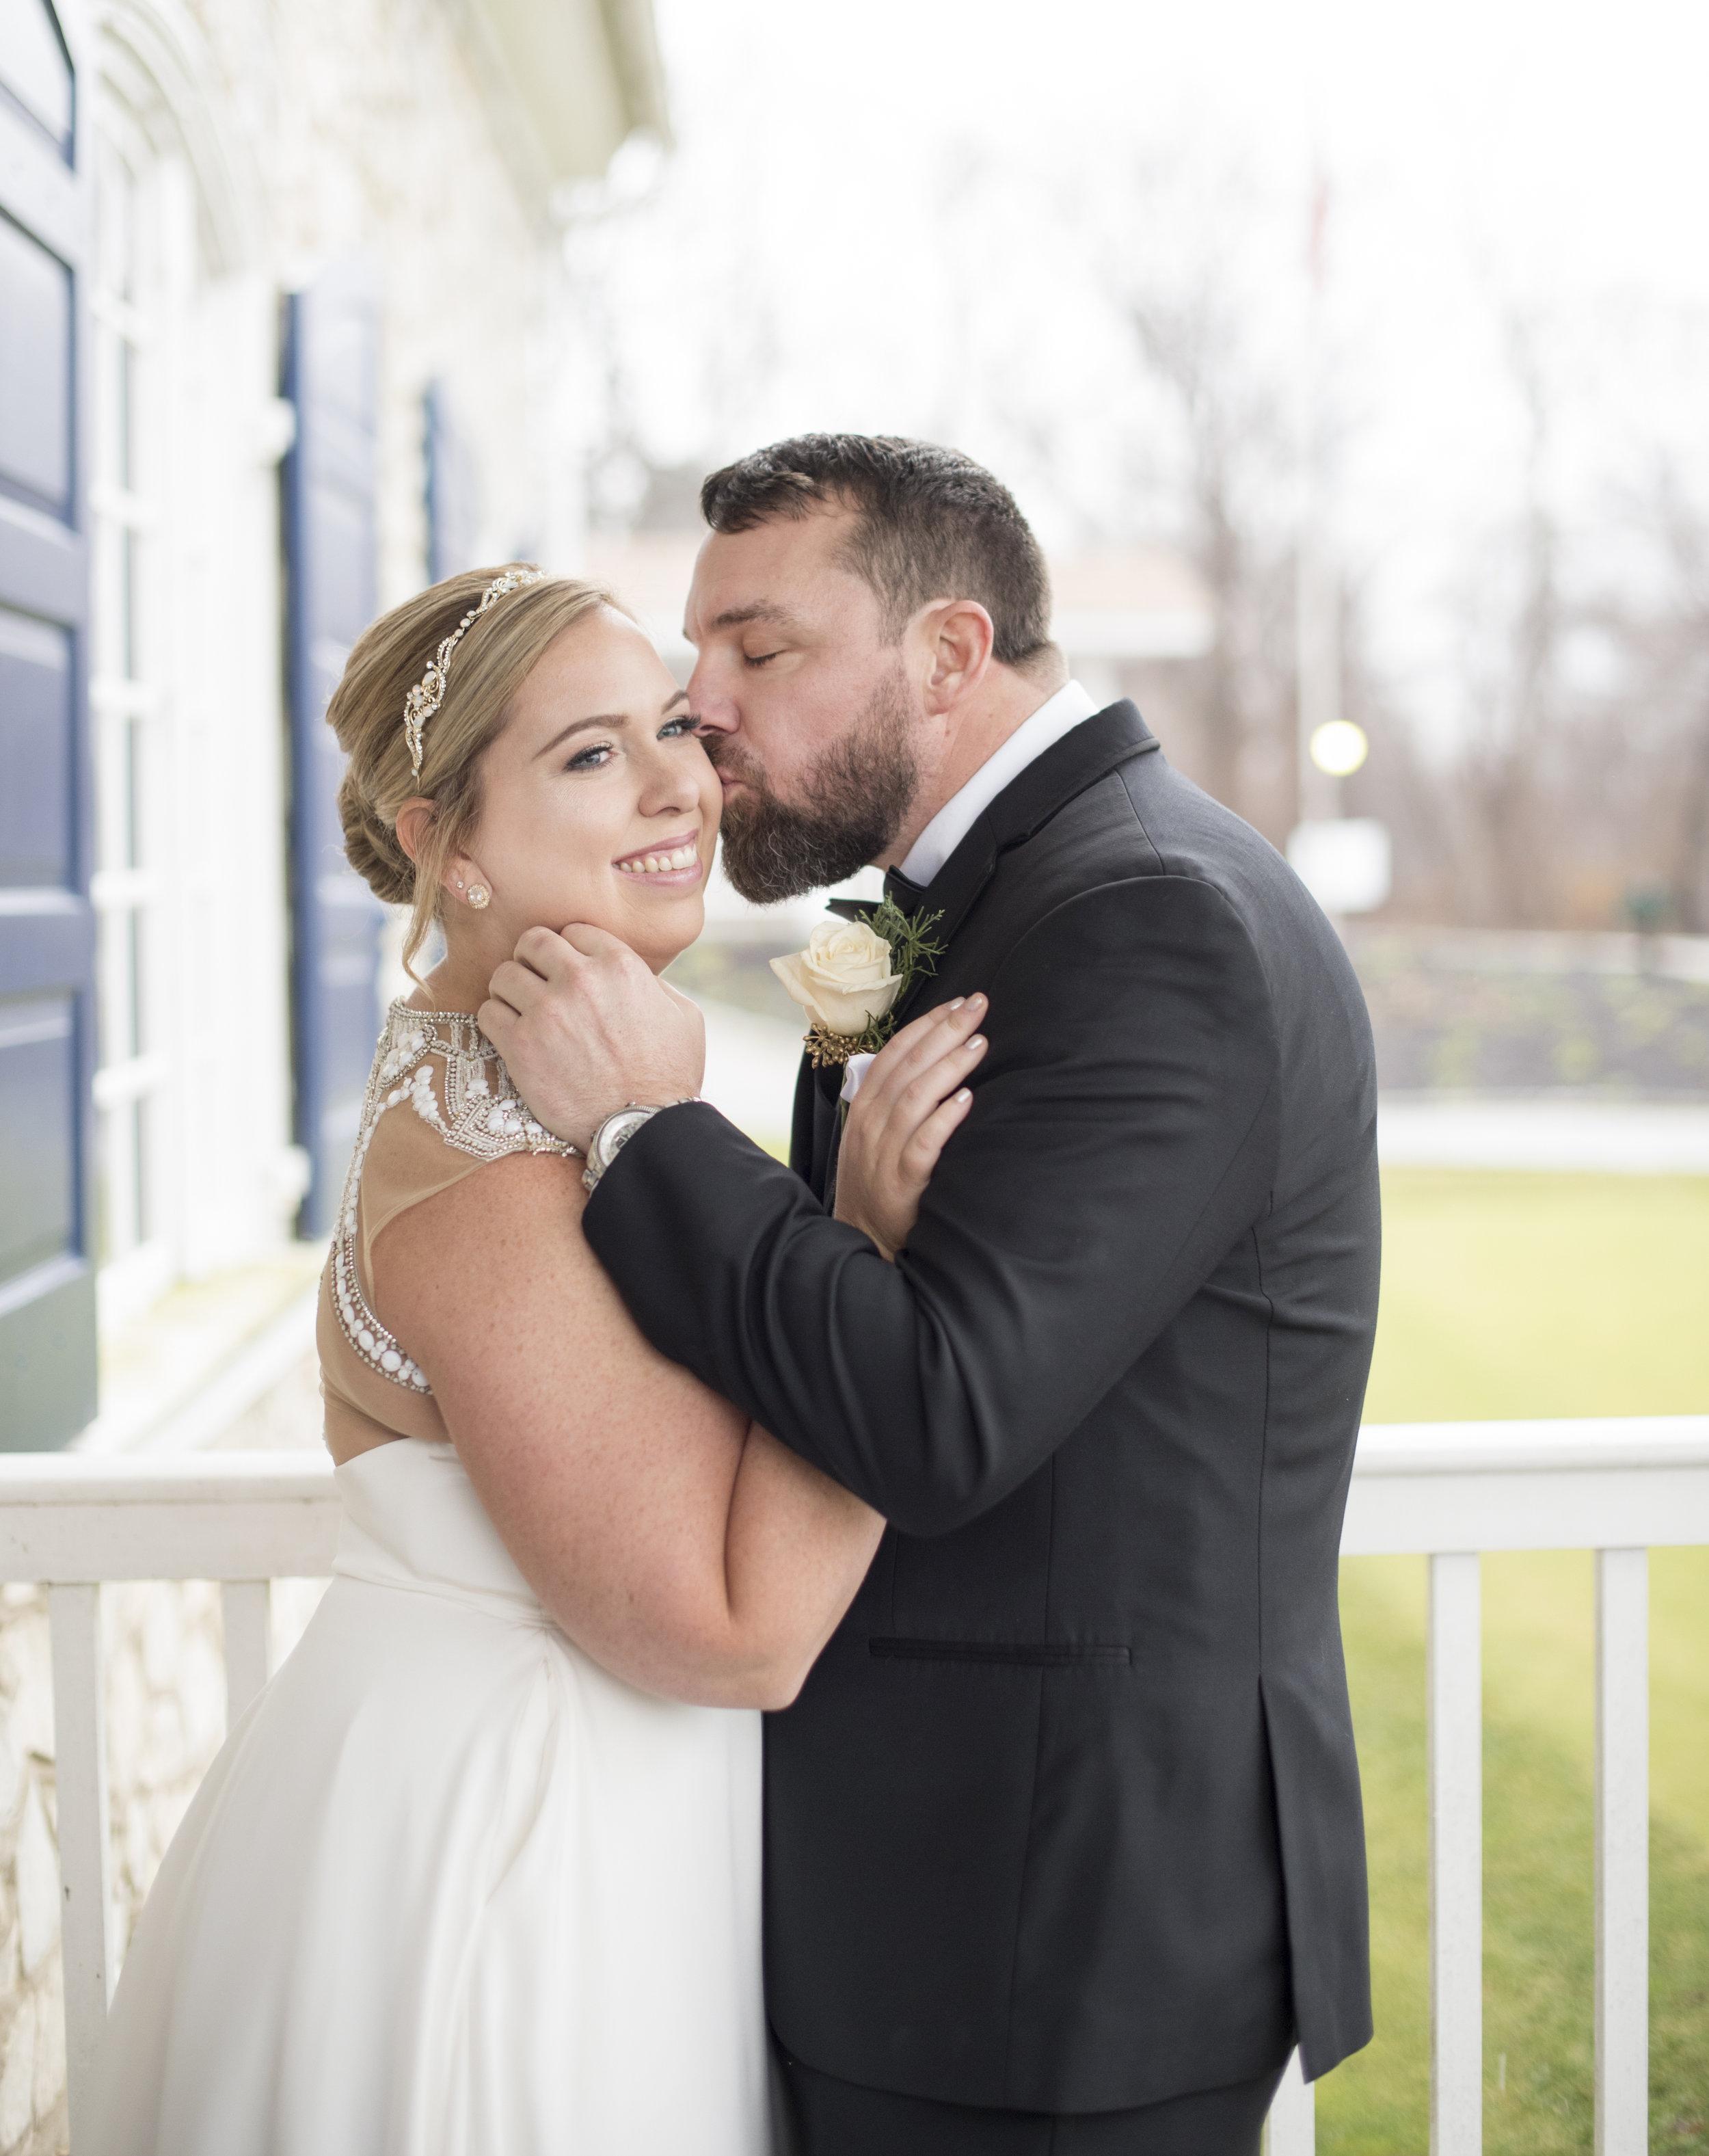 Wedding at Downingtown Country Club, PA